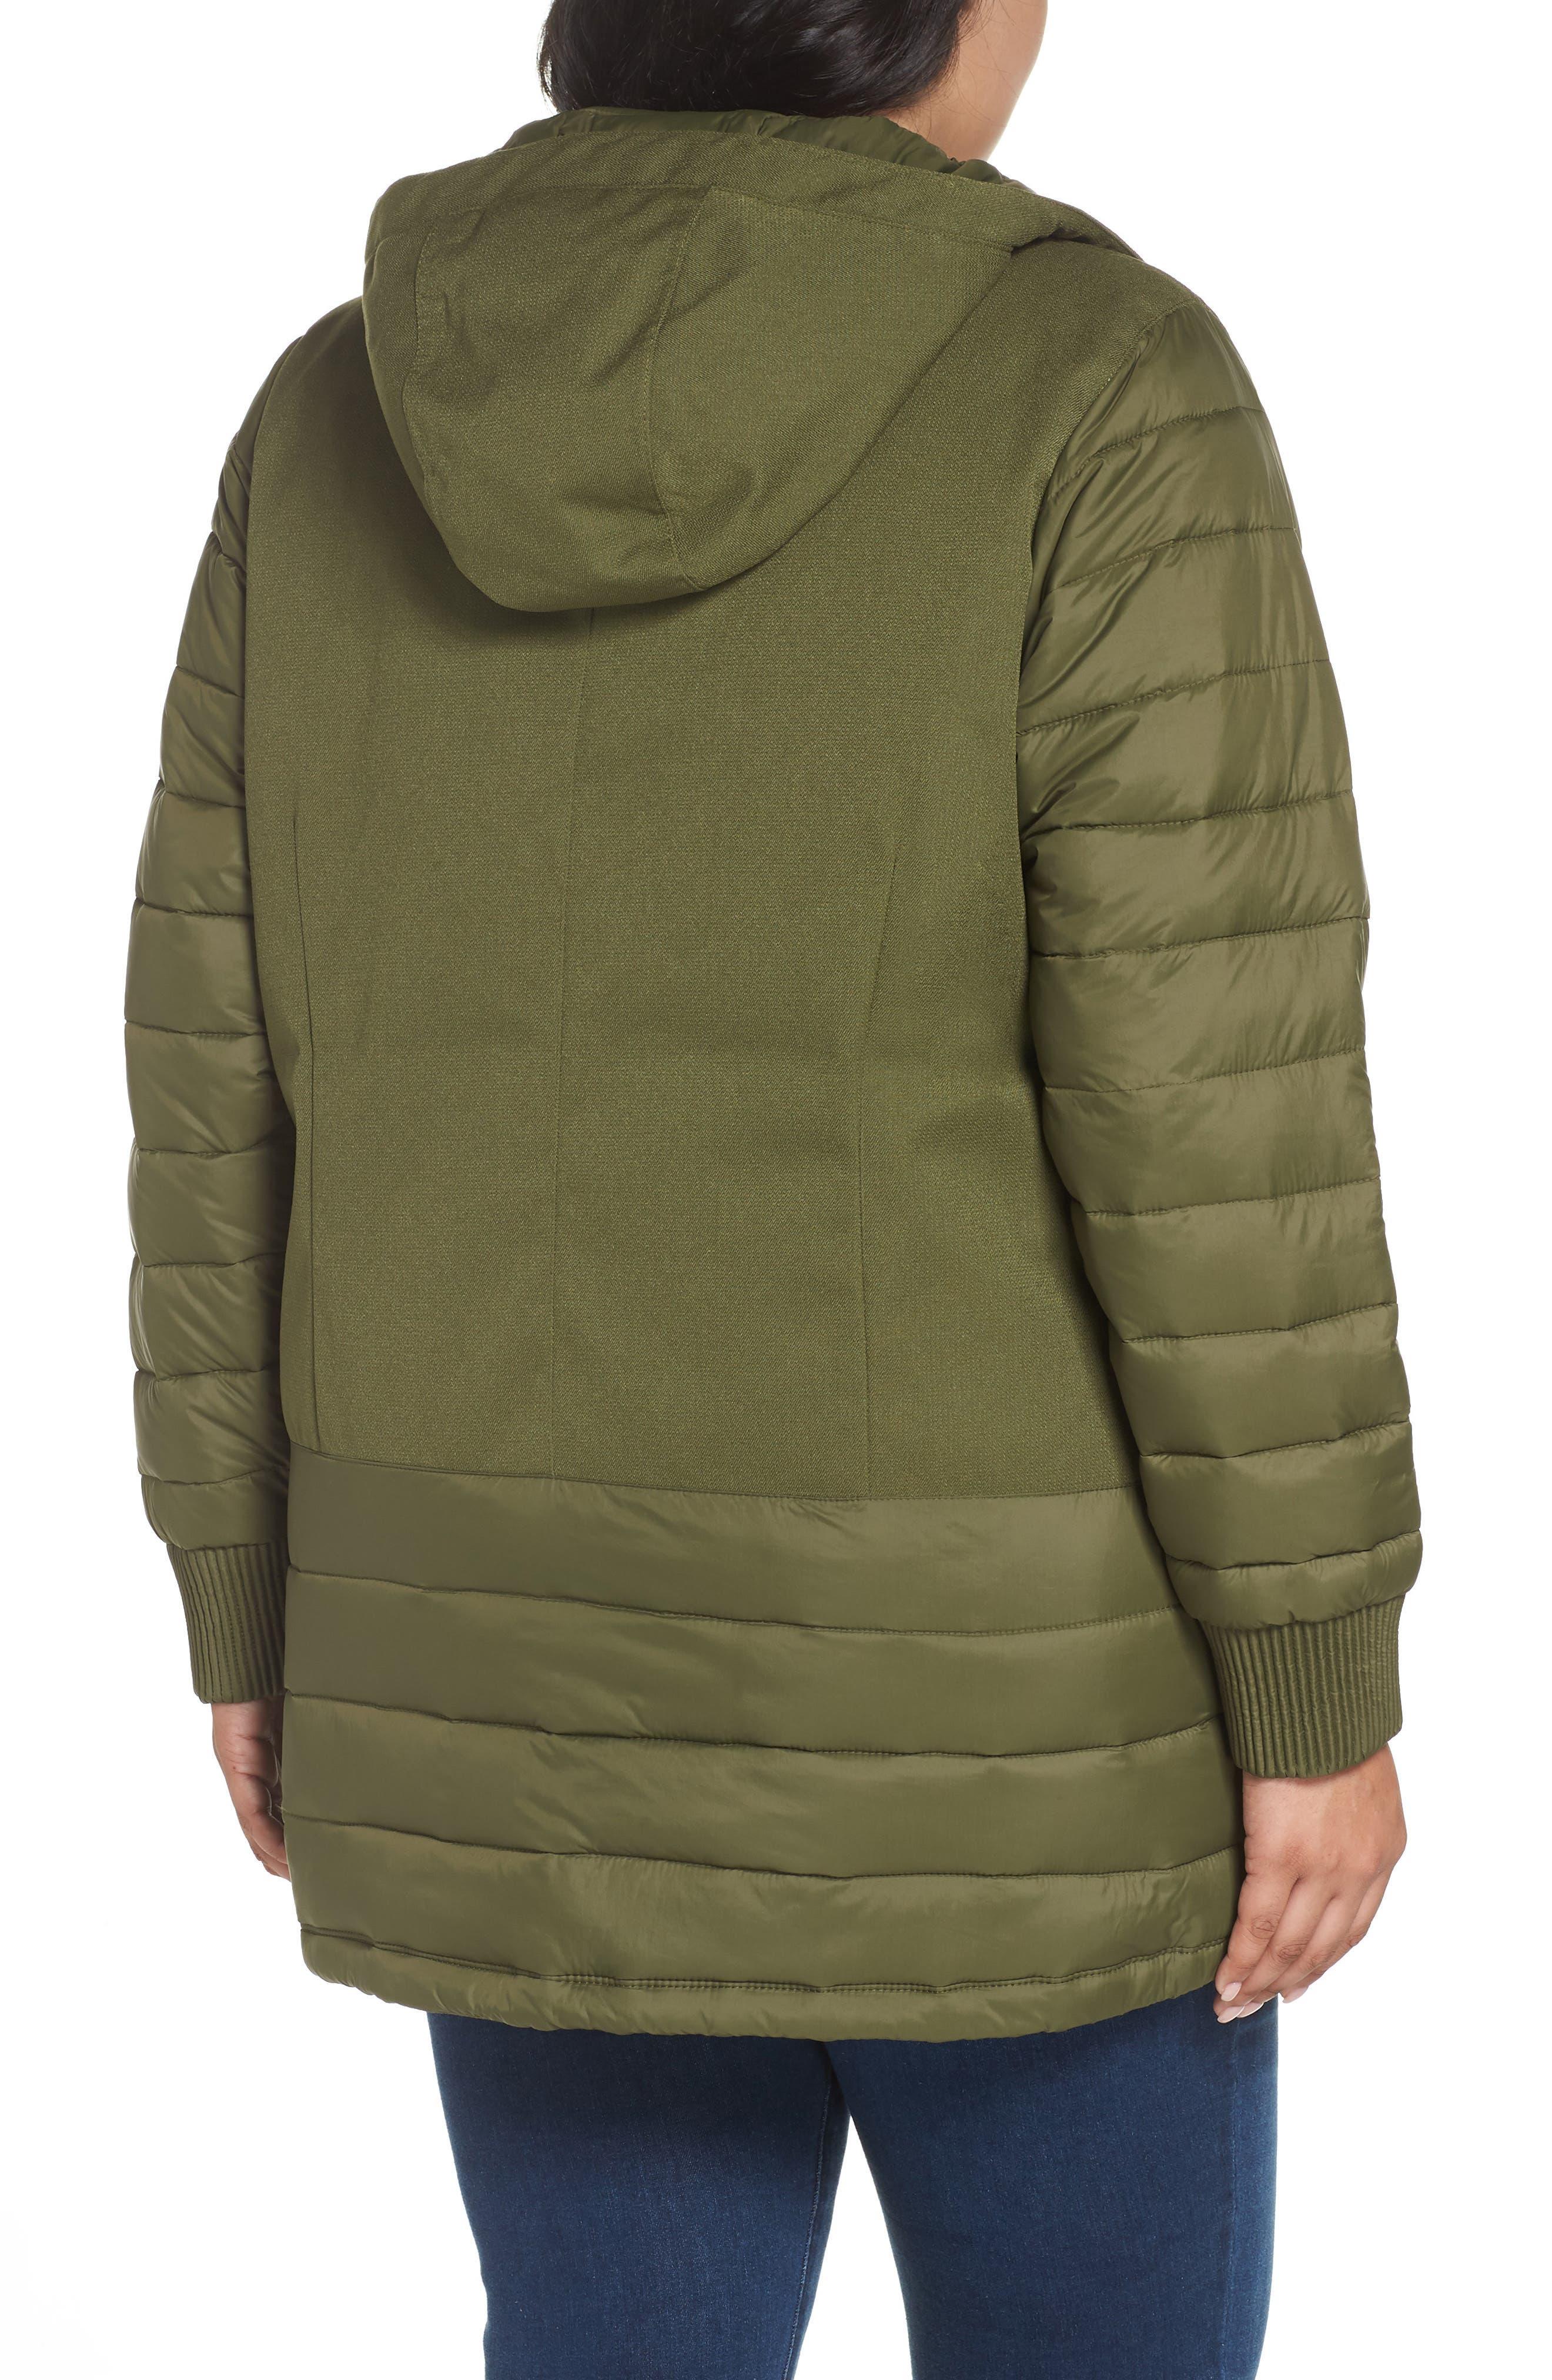 Boundary Bay Waterproof Hybrid Jacket,                             Alternate thumbnail 2, color,                             383